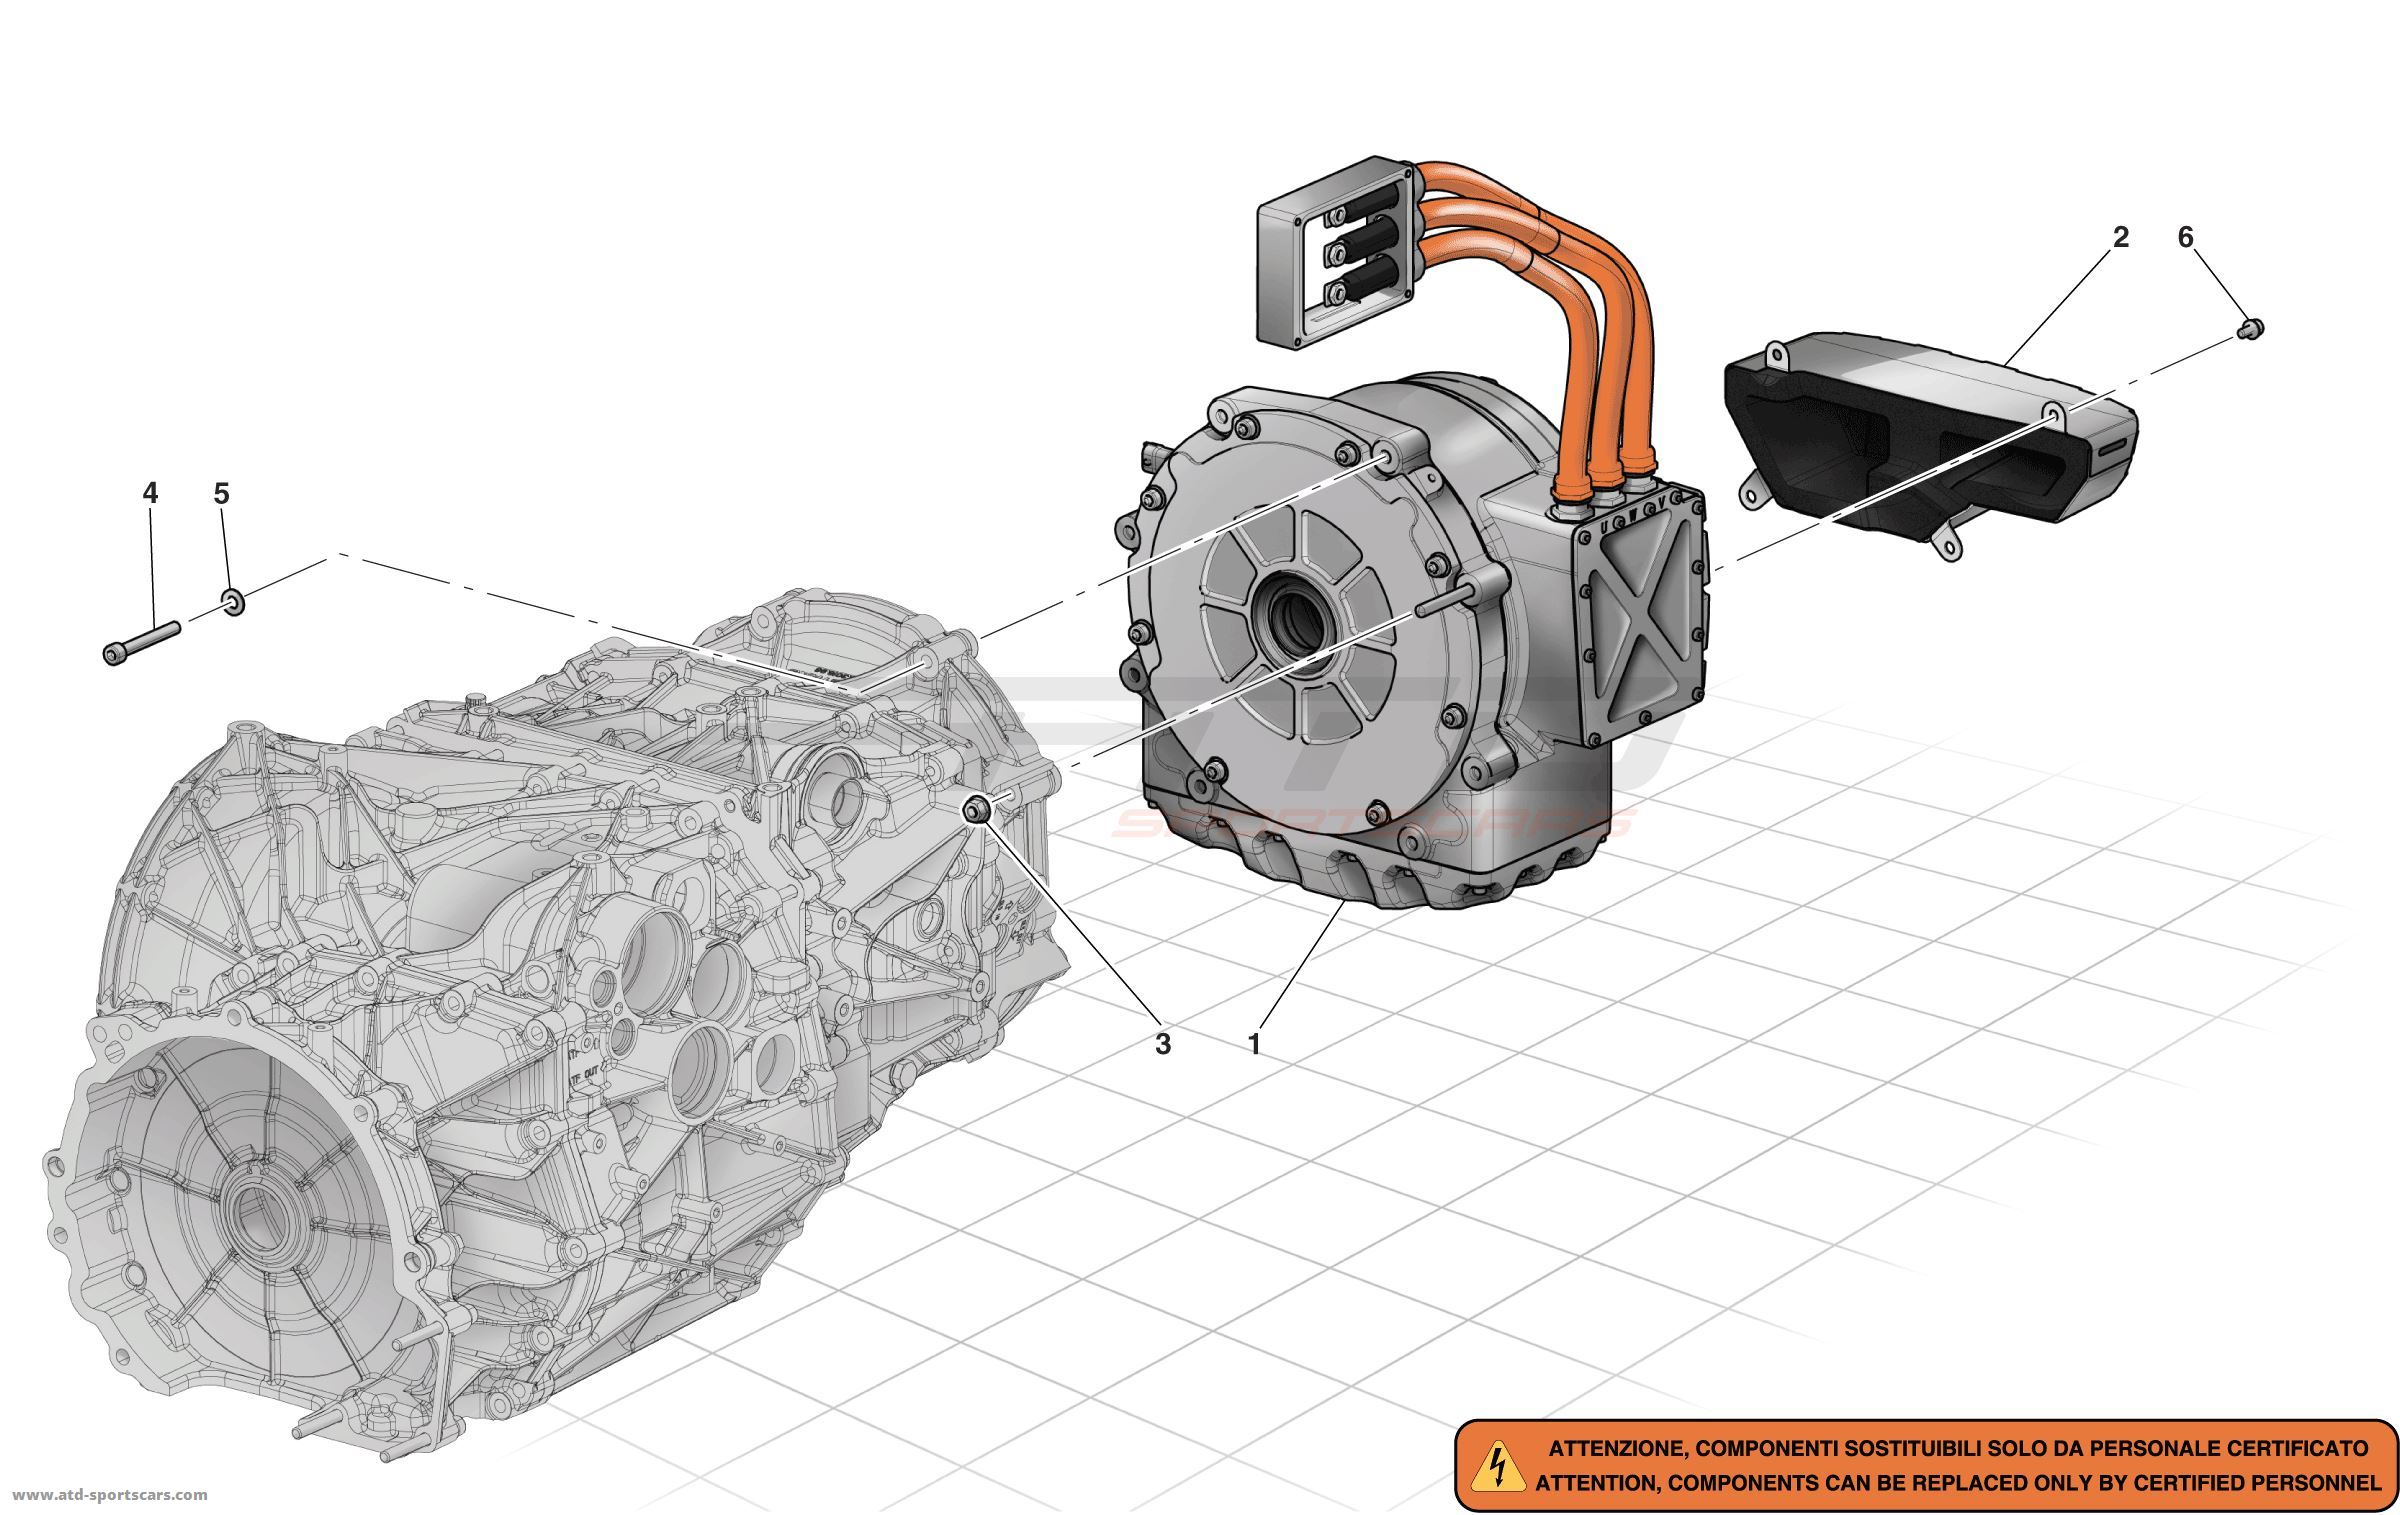 Laferrari Electric Motor Atd Sportscars Ferrari Electrical Wiring Diagram Technical Image Of 0019